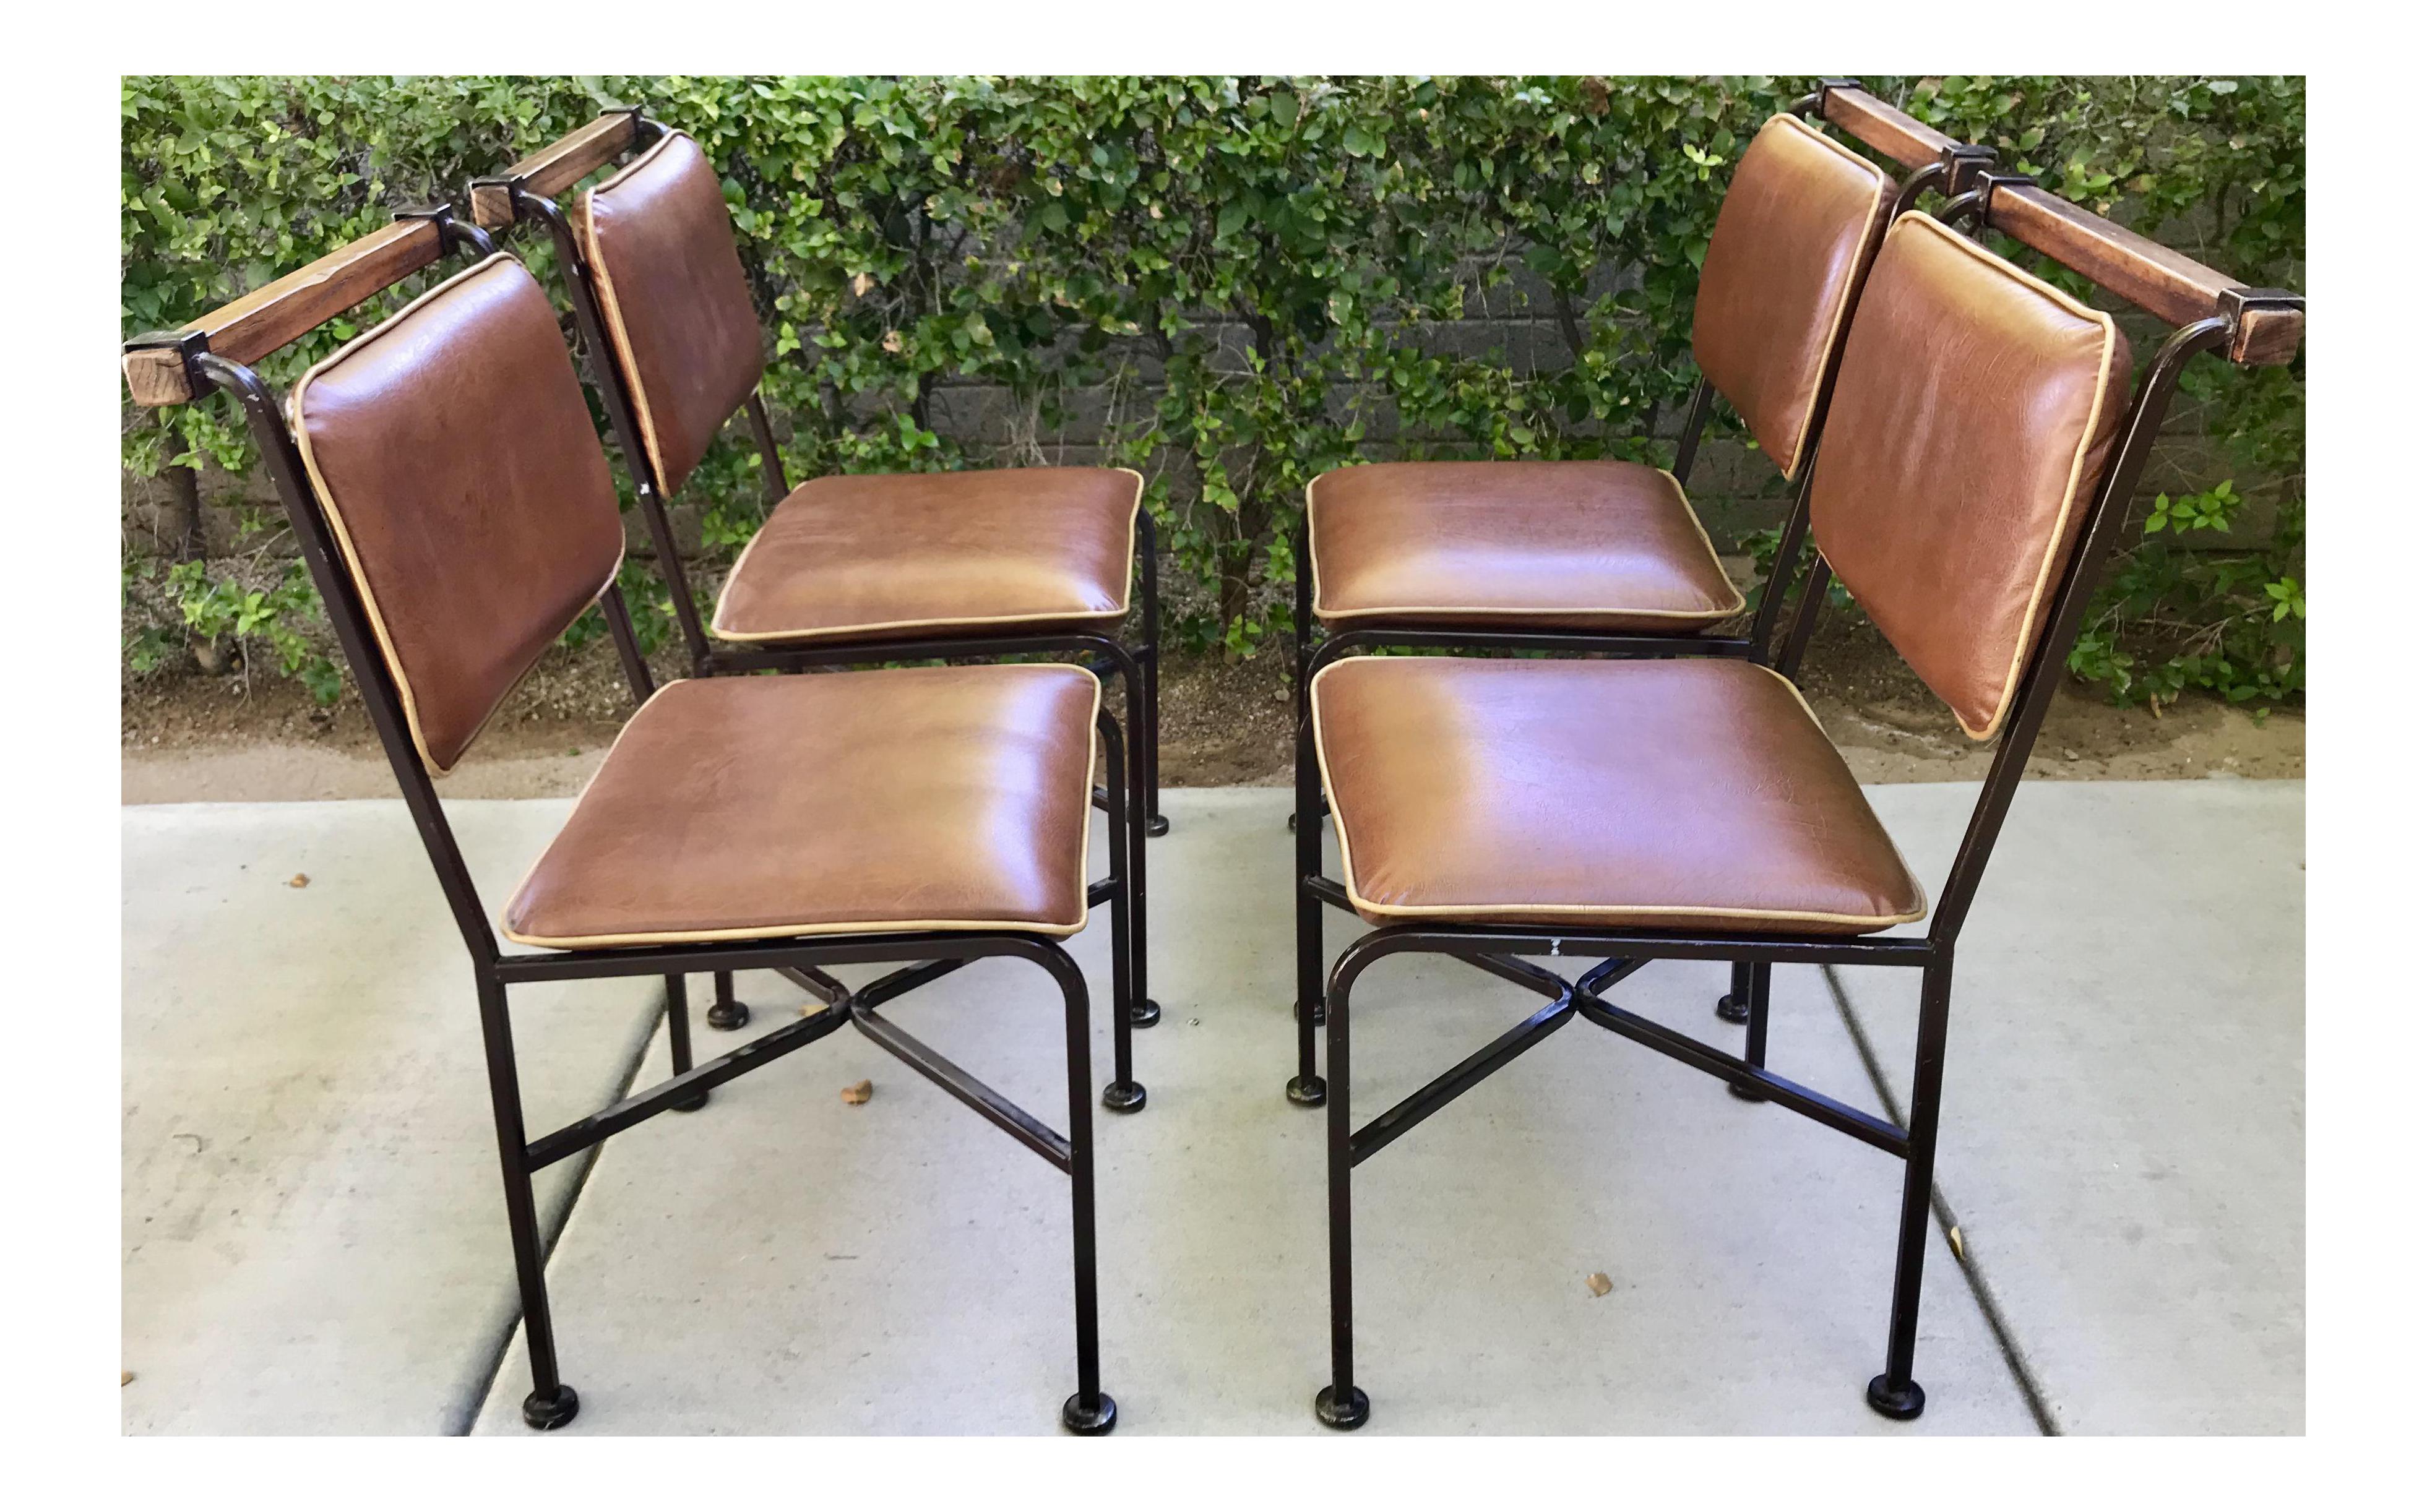 Rustic modern cleo baldon dining chairs set of 4 chairish for Modern dining chairs ireland